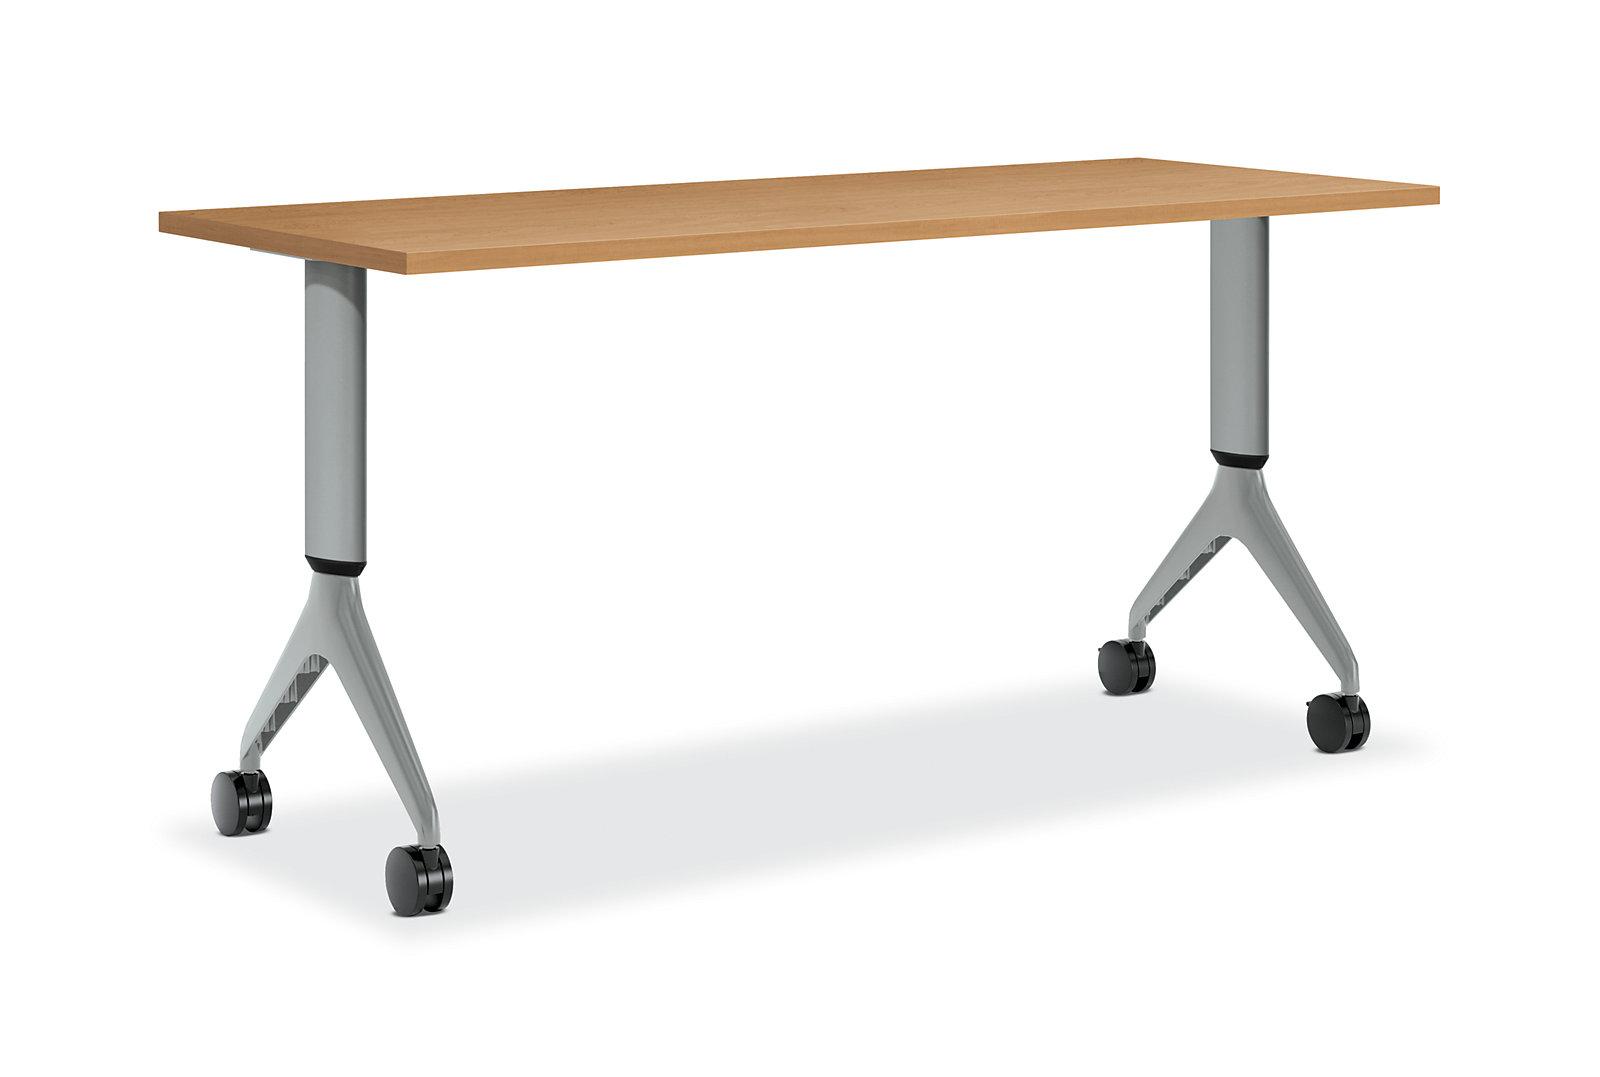 abide table source office item training furniture series nashville